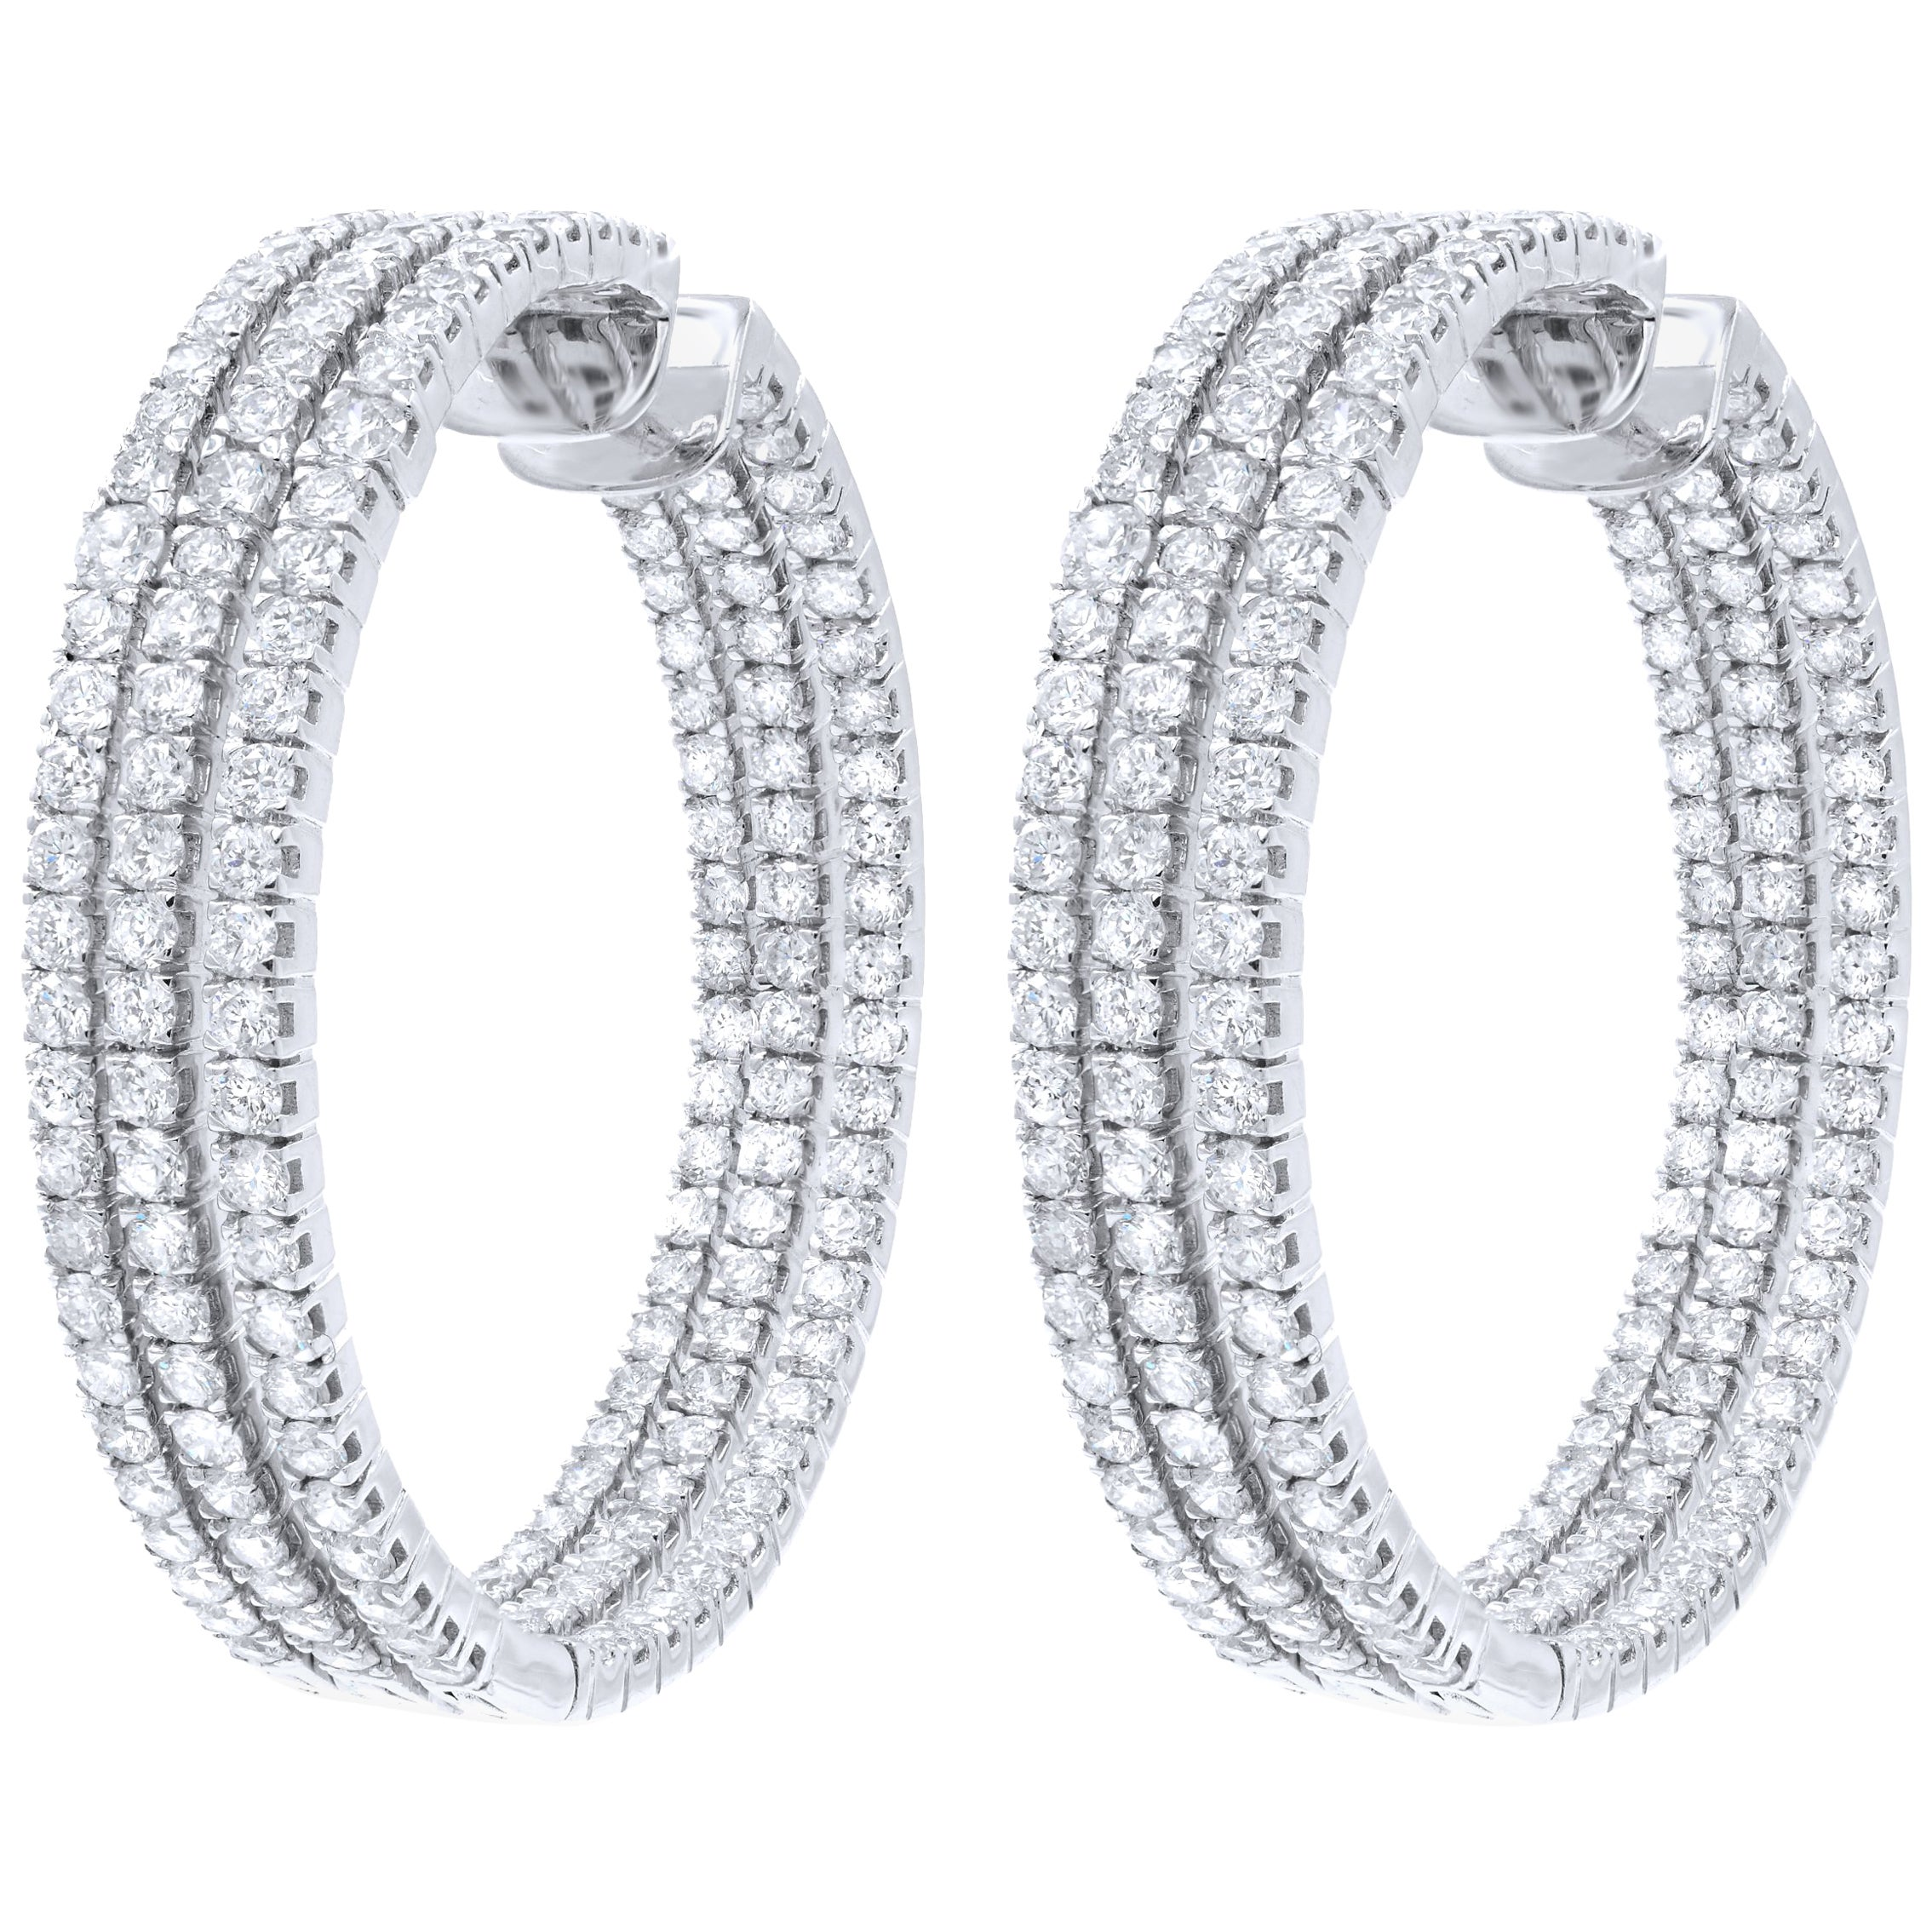 Triple Row Diamond Hoop Earrings 8.33 Carat in 18 Karat White Gold